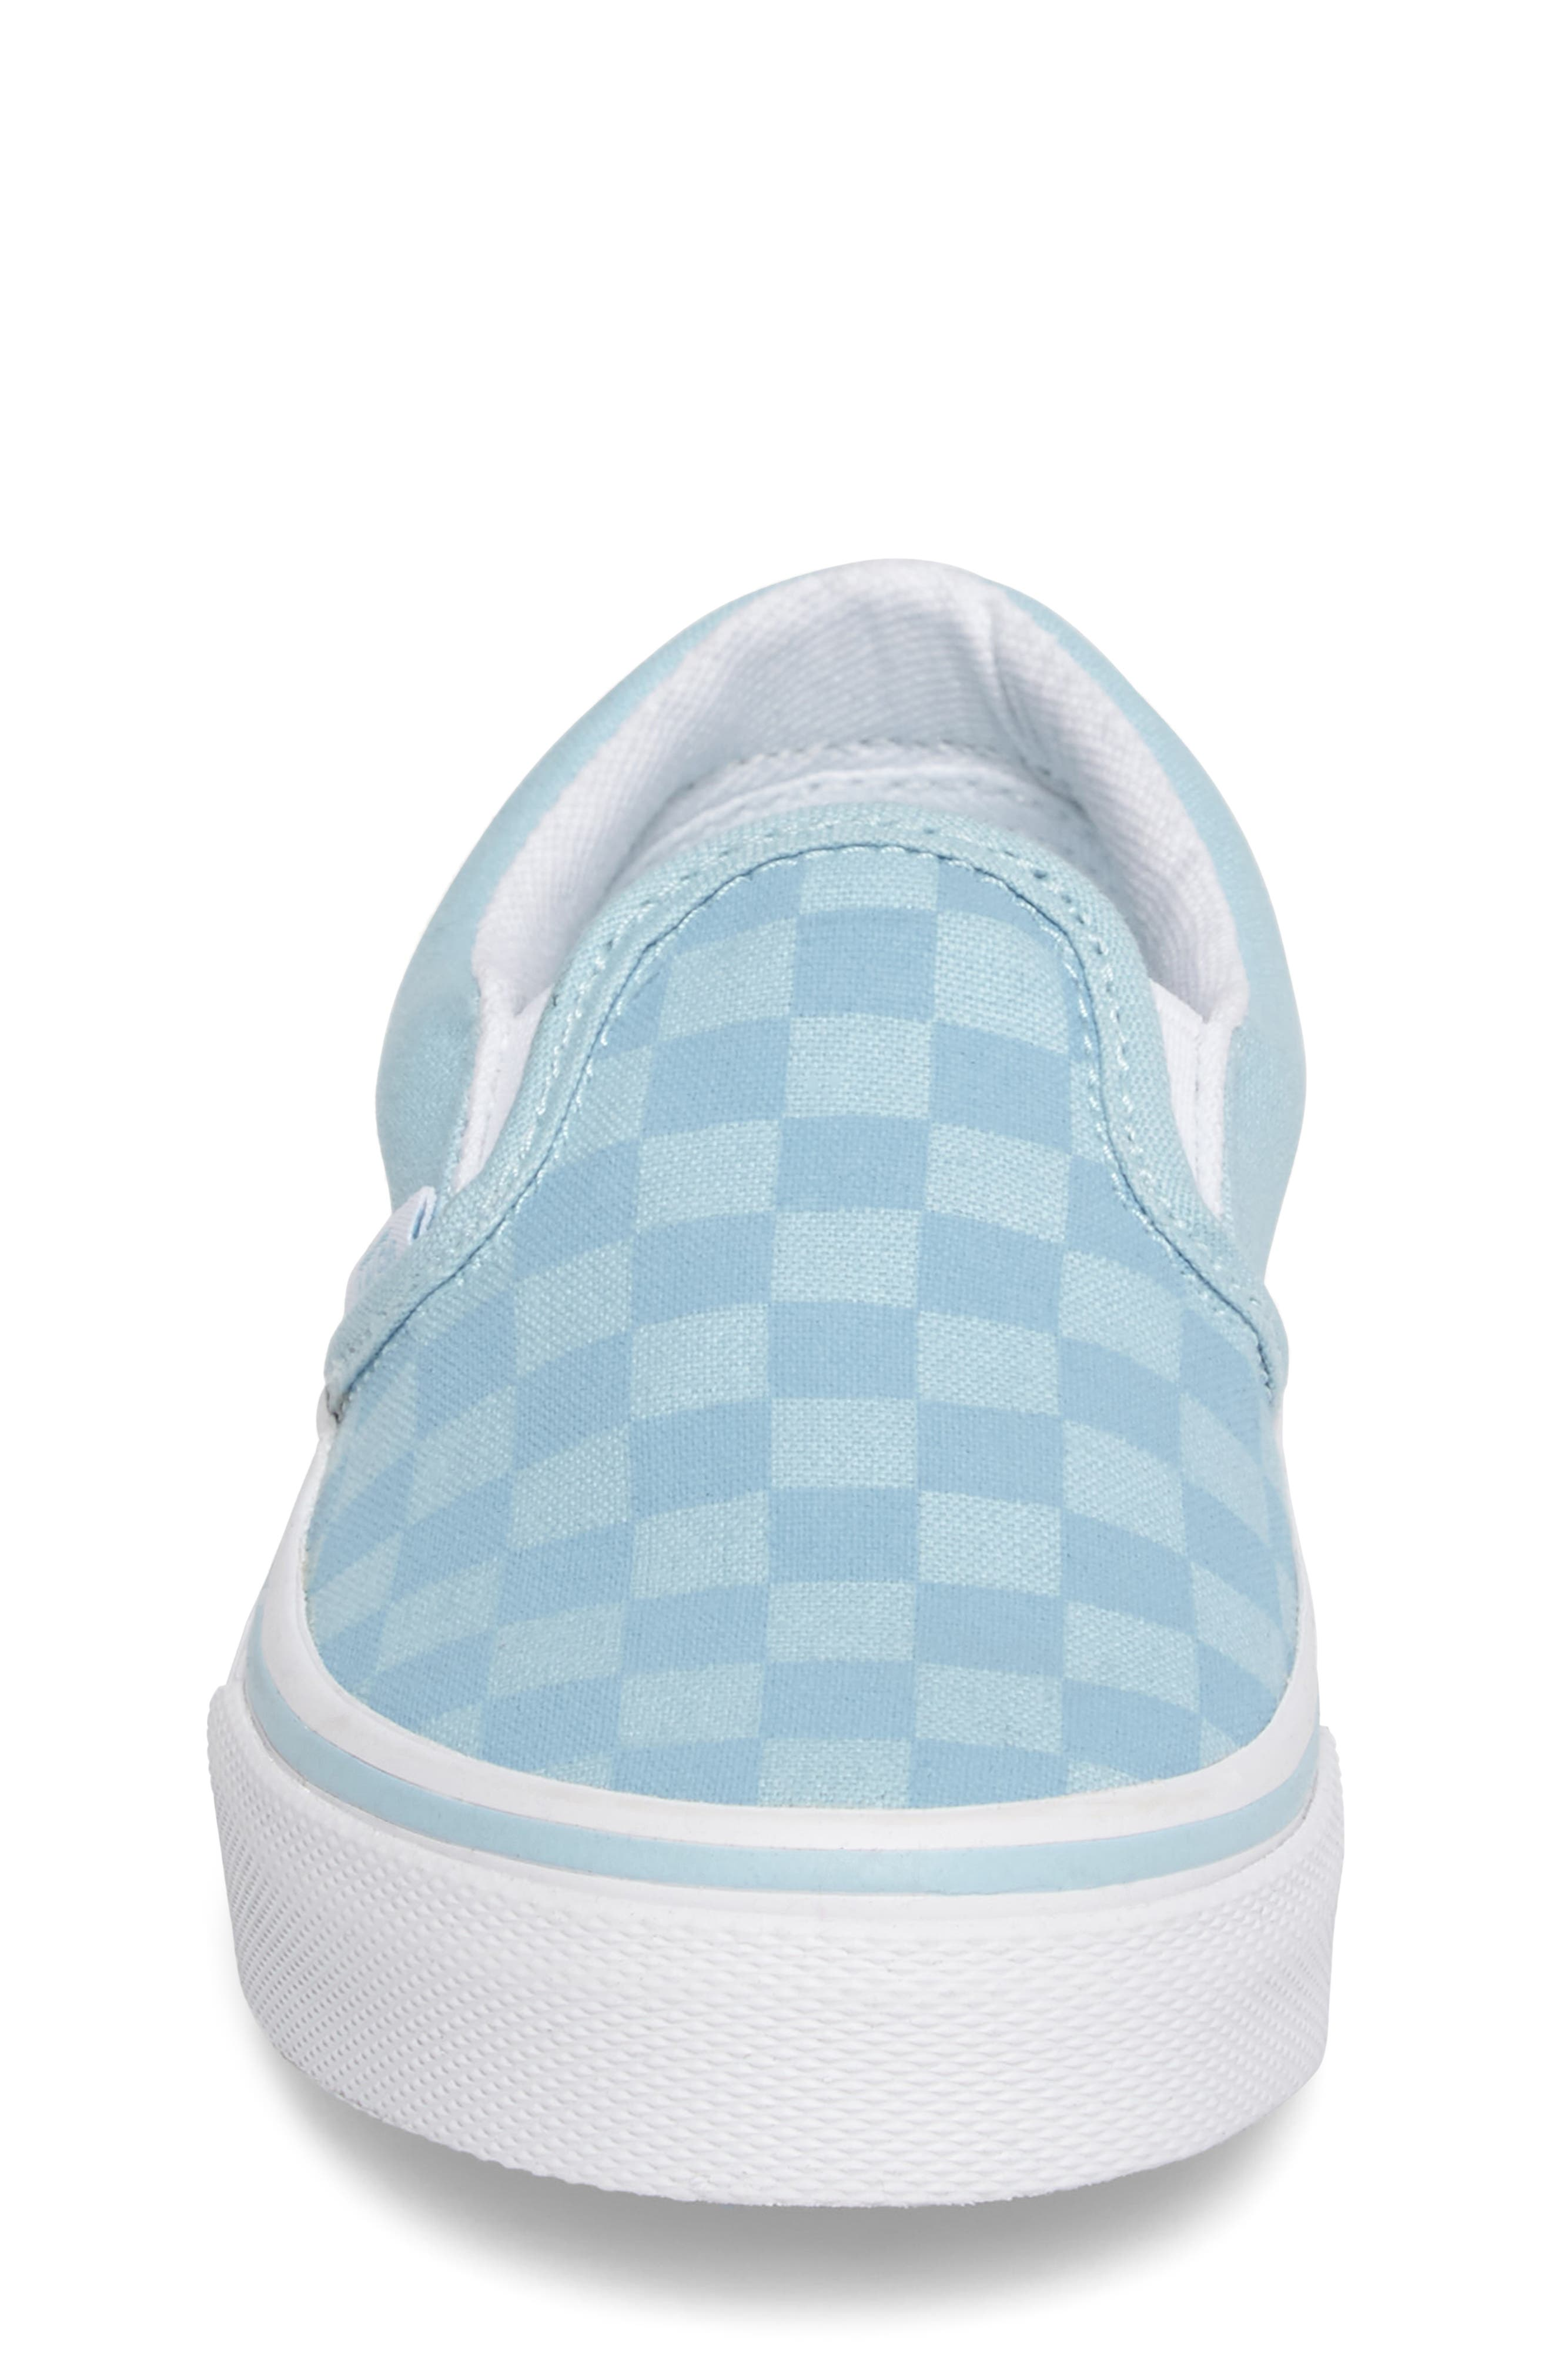 Alternate Image 4  - Vans Classic Slip-On Sneaker (Walker, Toddler, Little Kid & Big Kid)